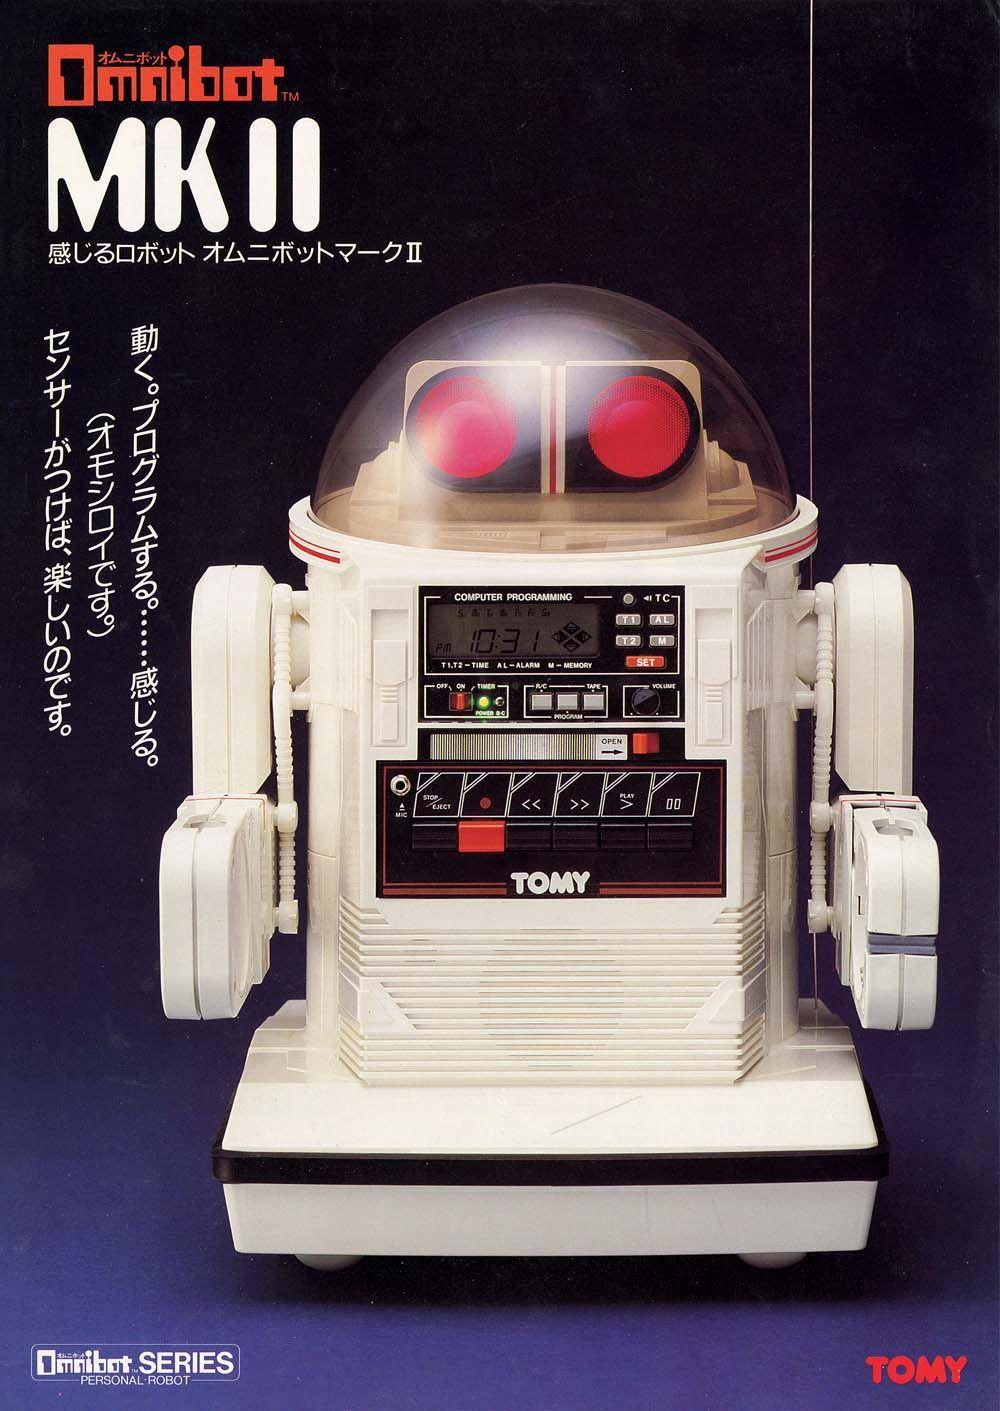 Tomy Omnibot 5402 Vintage Robots Retro Robot Retro Futurism